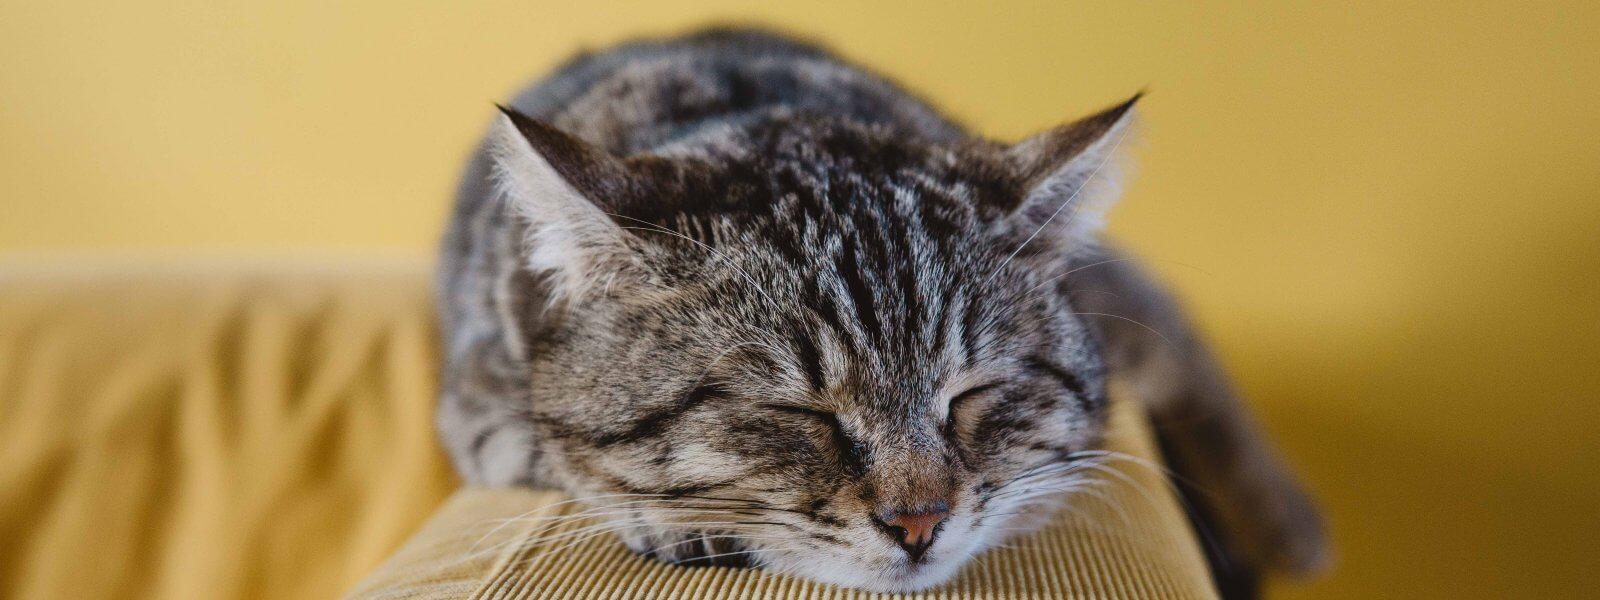 3 fascinating sleep facts